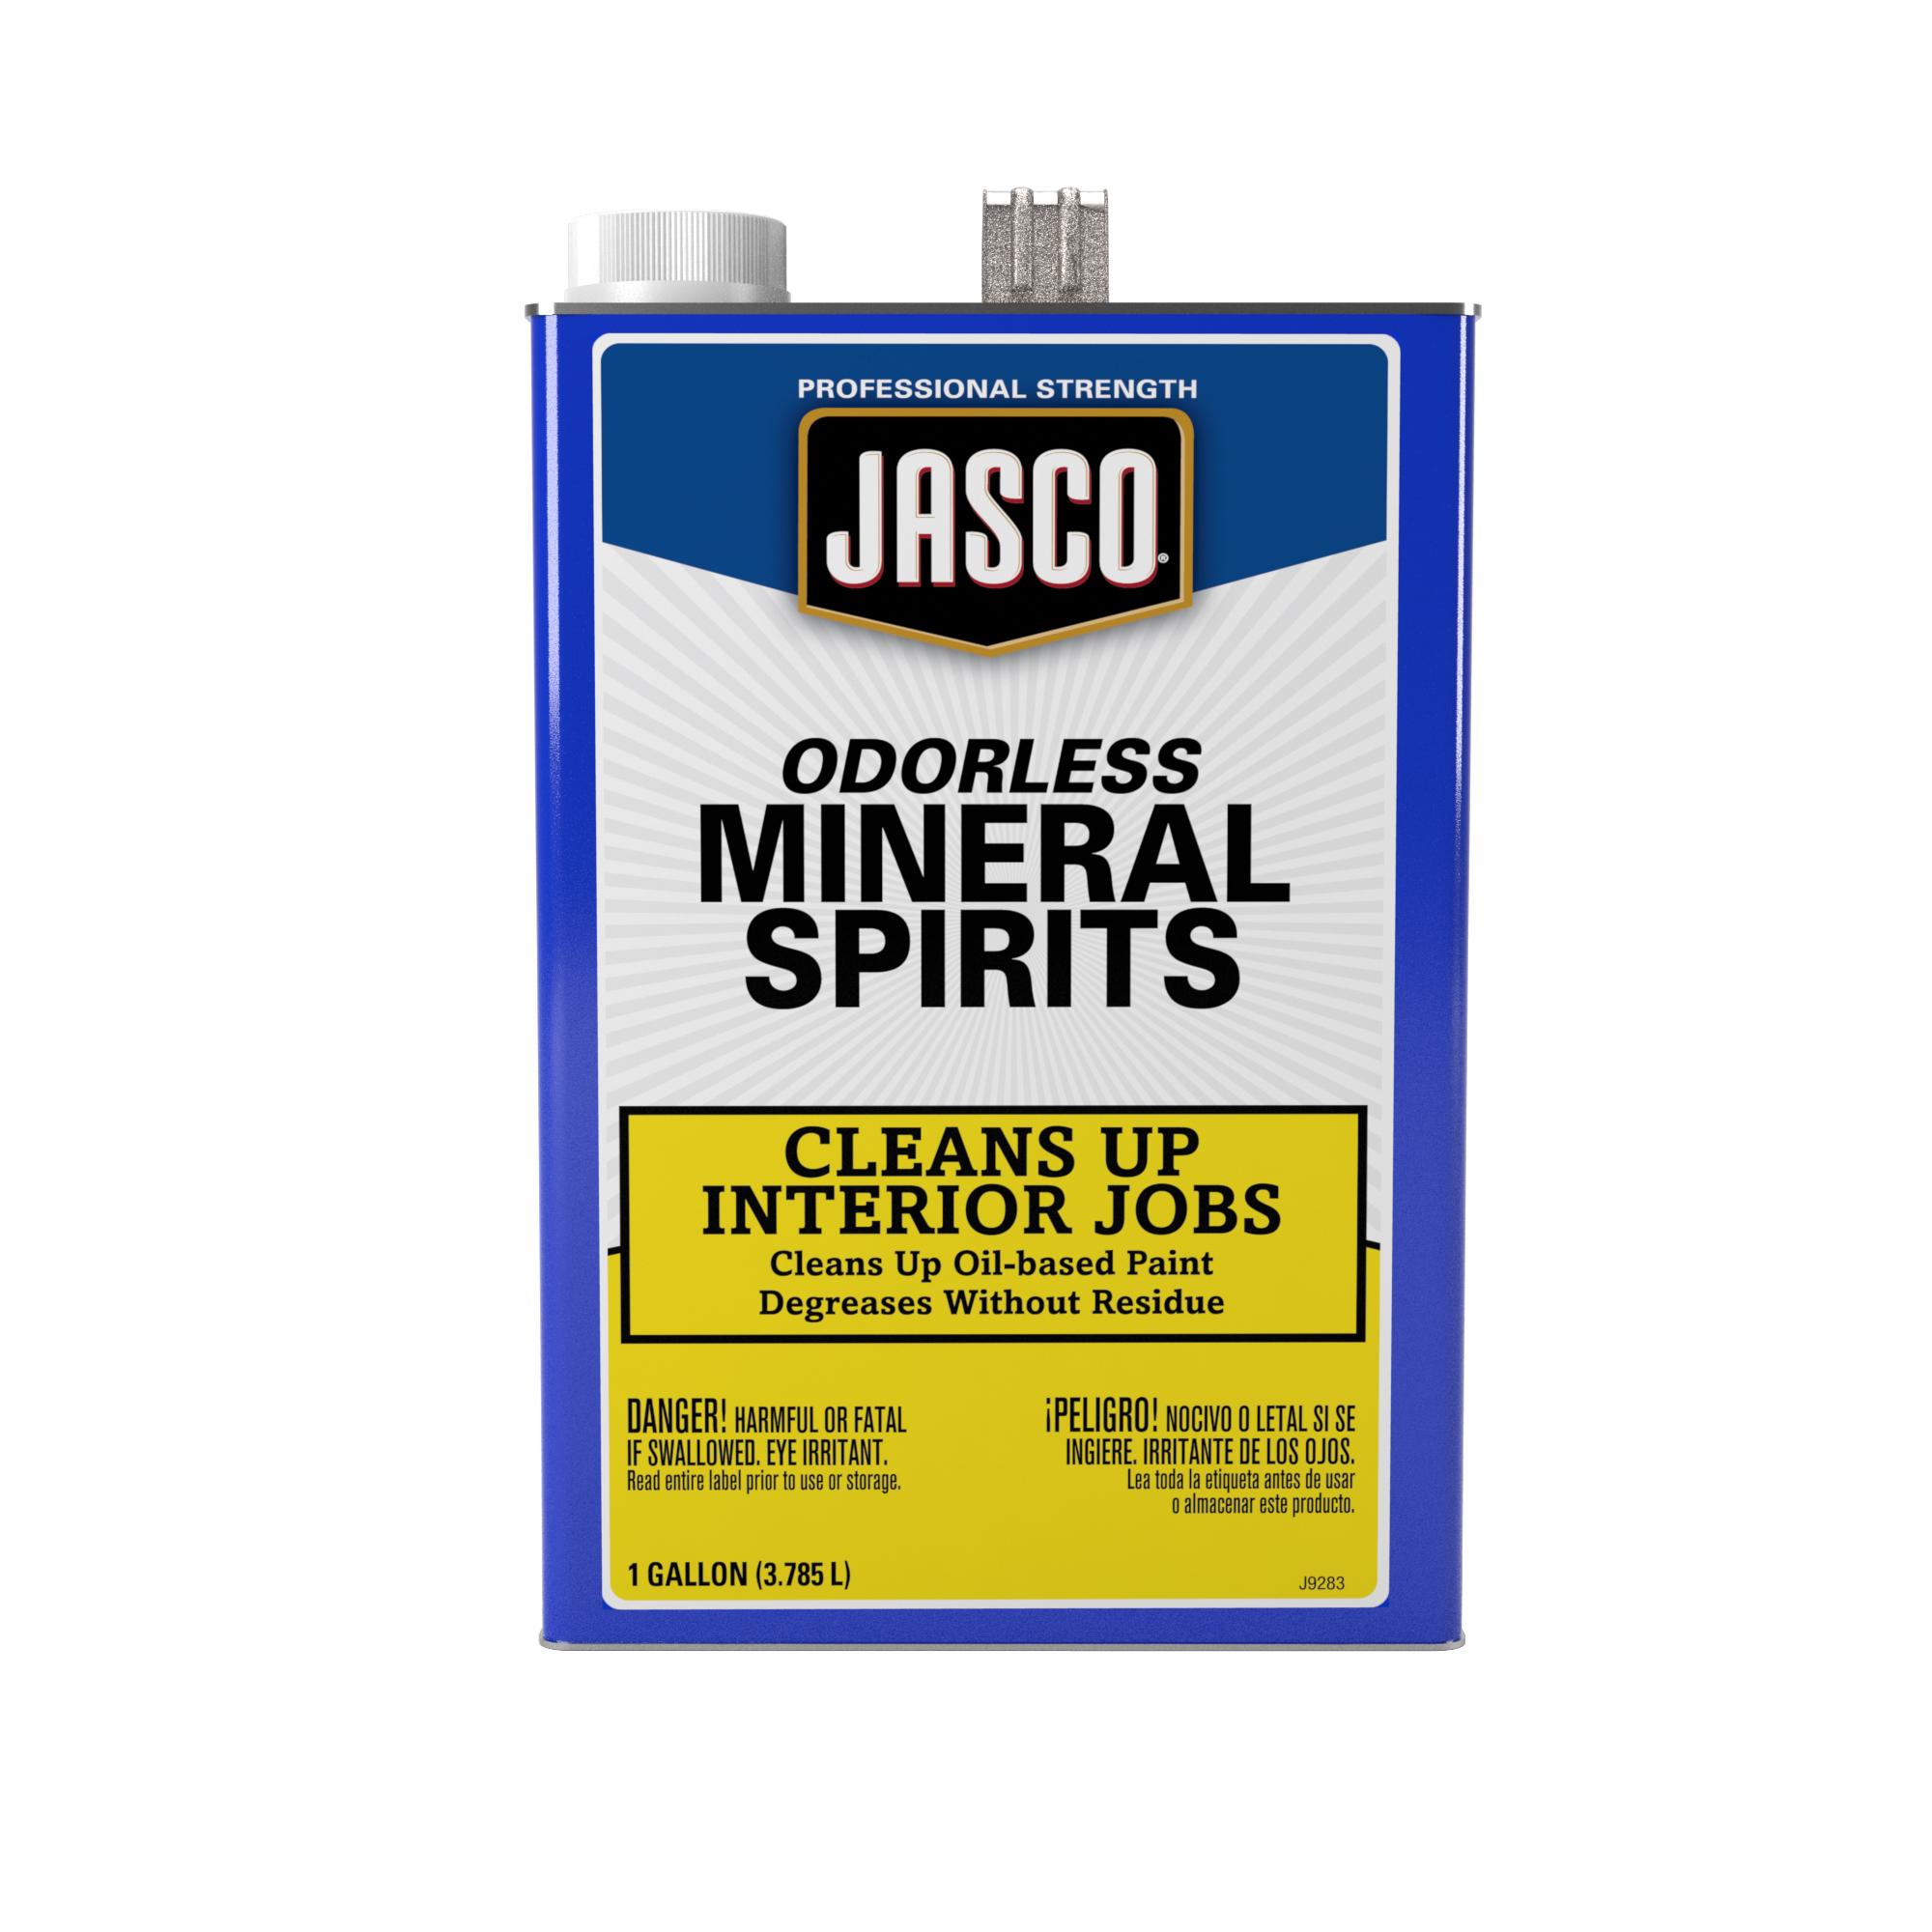 Odorless Mineral Spirits California